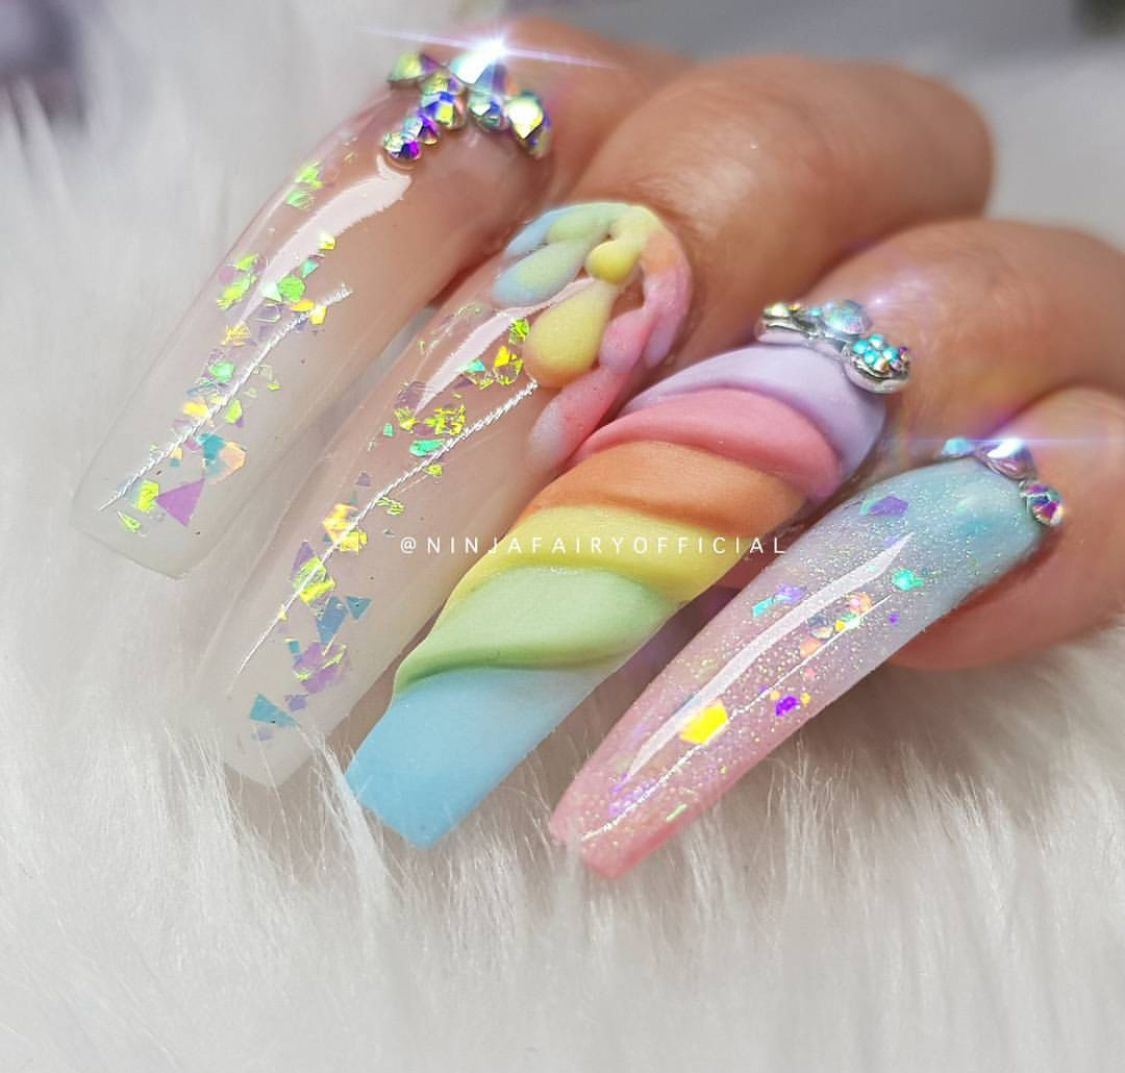 Pin de Danielle Lemon en Nail designs | Pinterest | Diseños de uñas ...